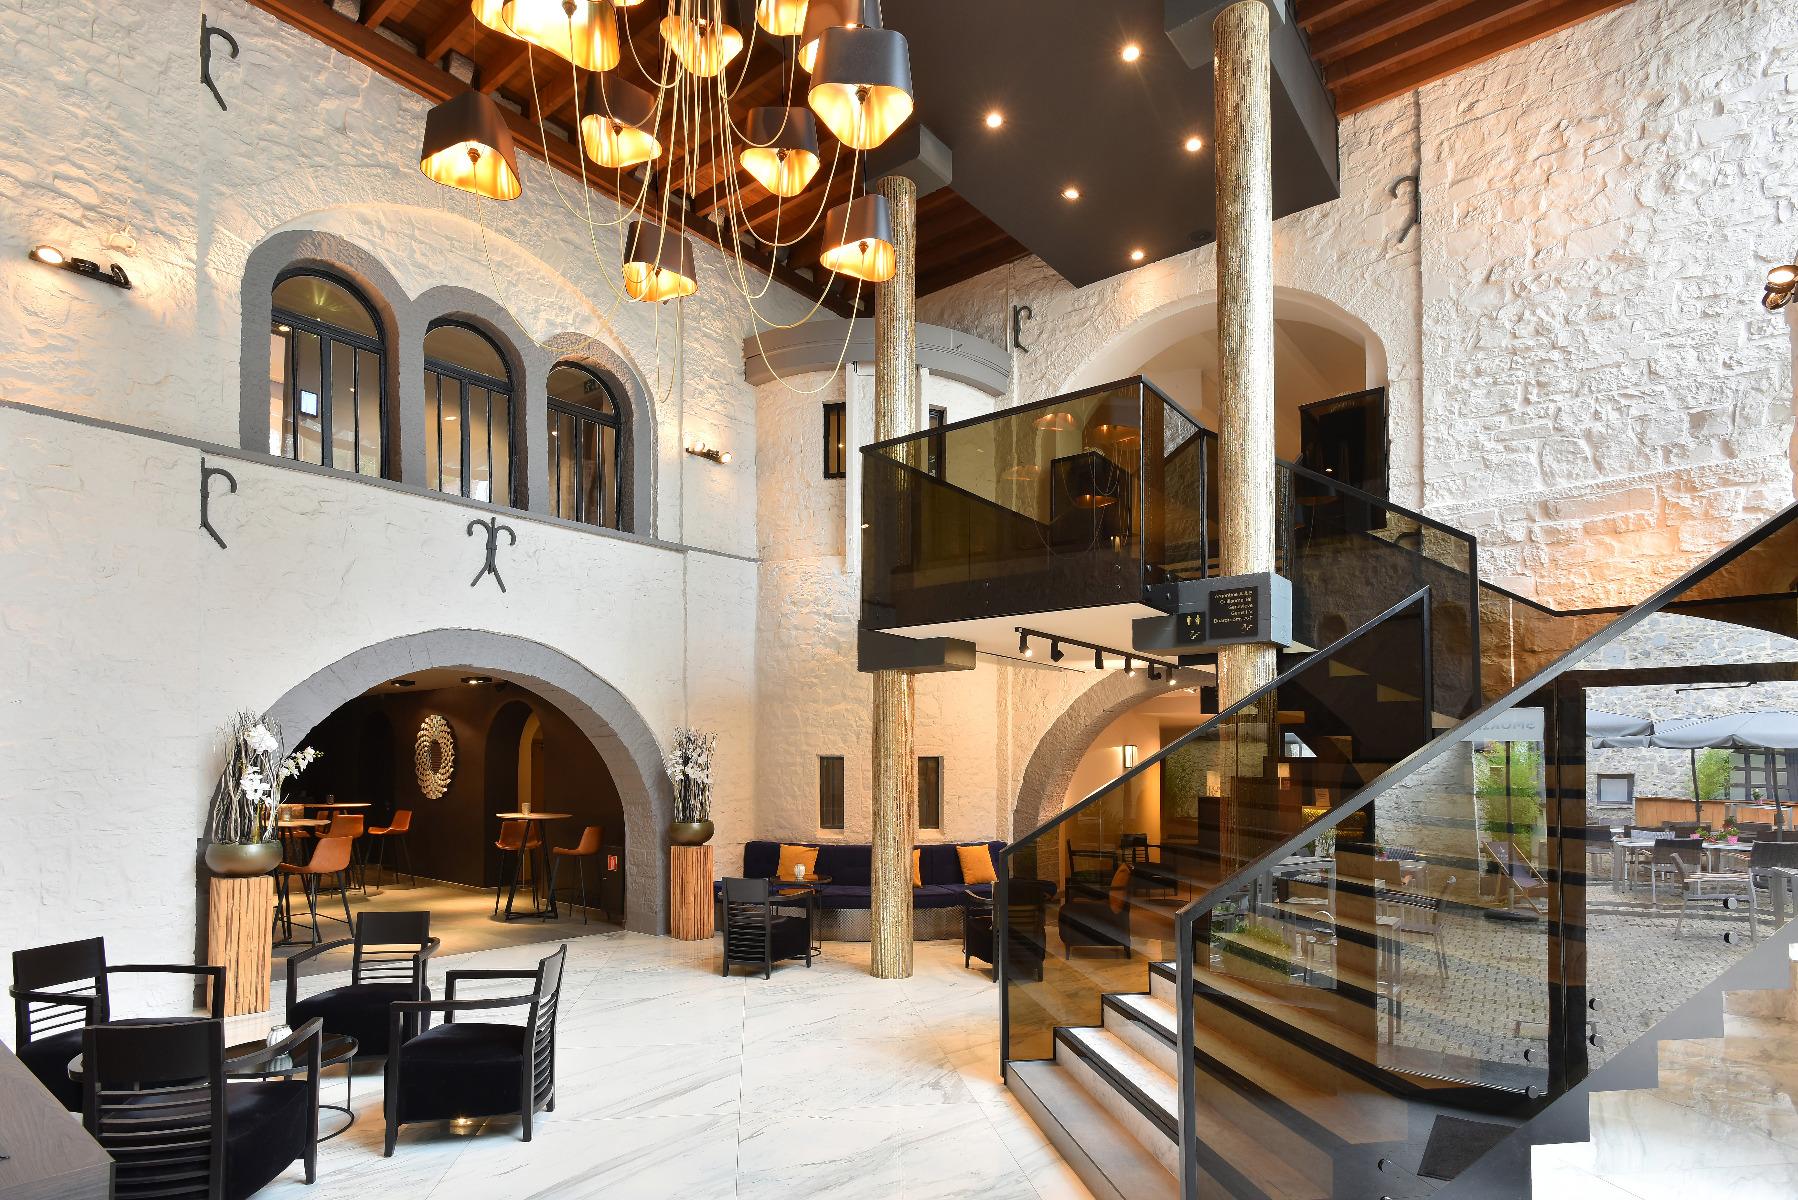 Golf-reizen-Golf-Expedition-België-Regio-Brussel-Martins-Chateau-du-Lac-lobby